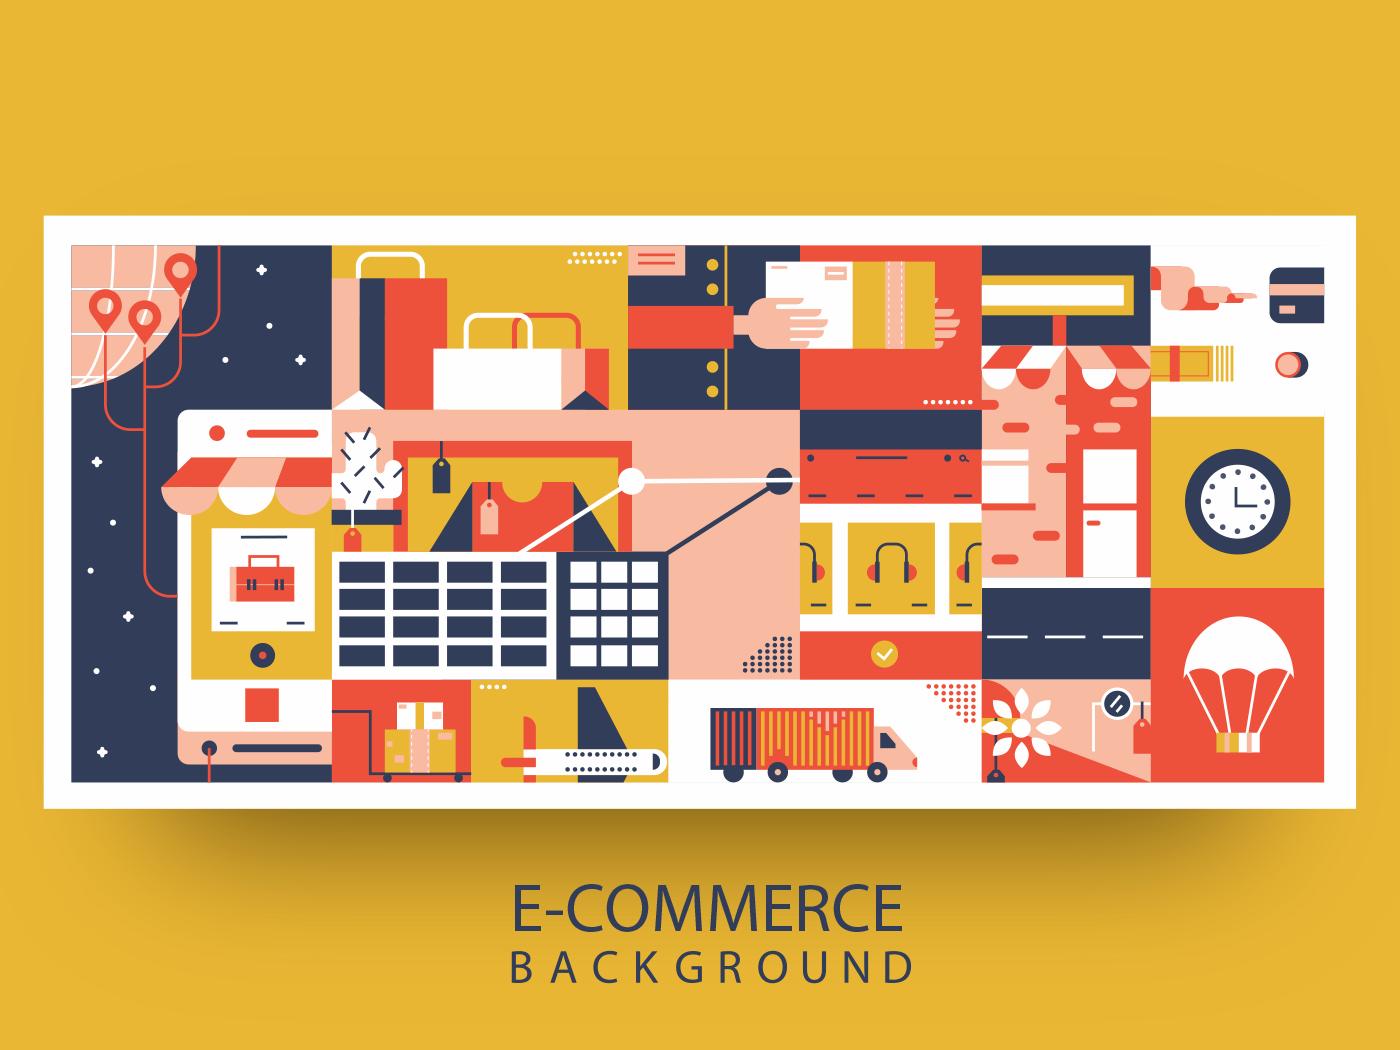 E-commerce online background